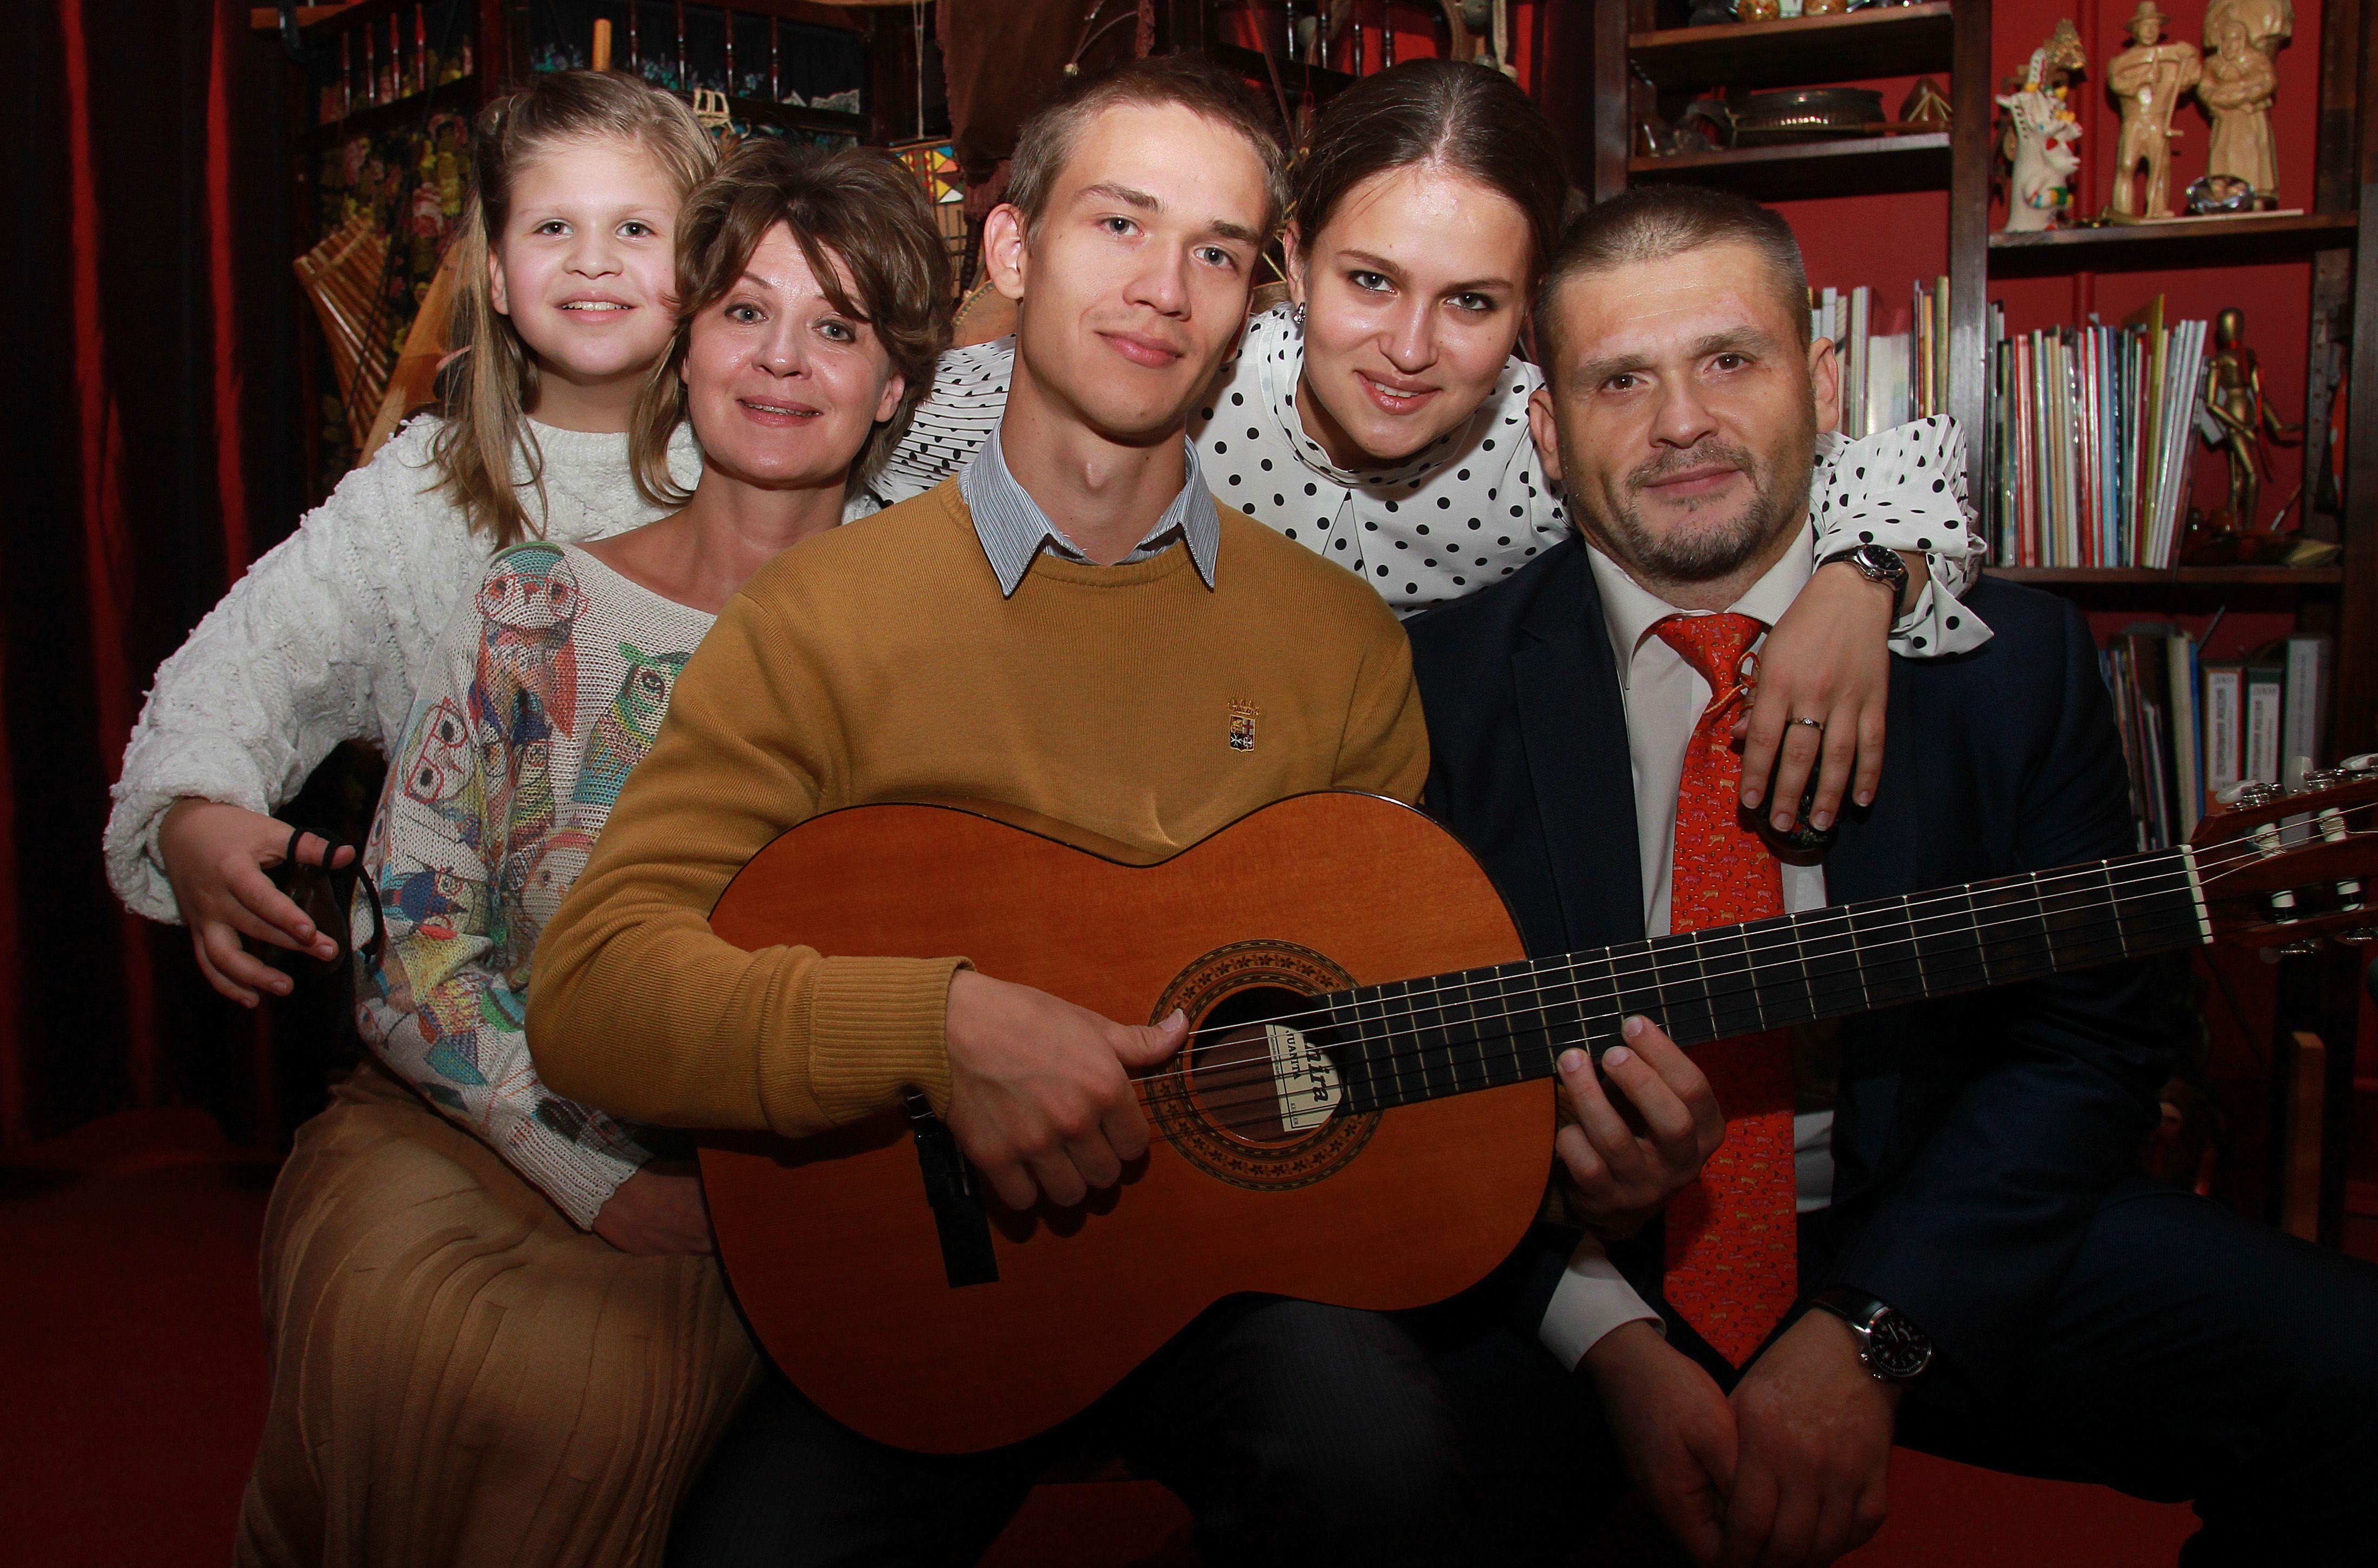 Россия сказочная: в Троицке дали старт онлайн-фестивалю